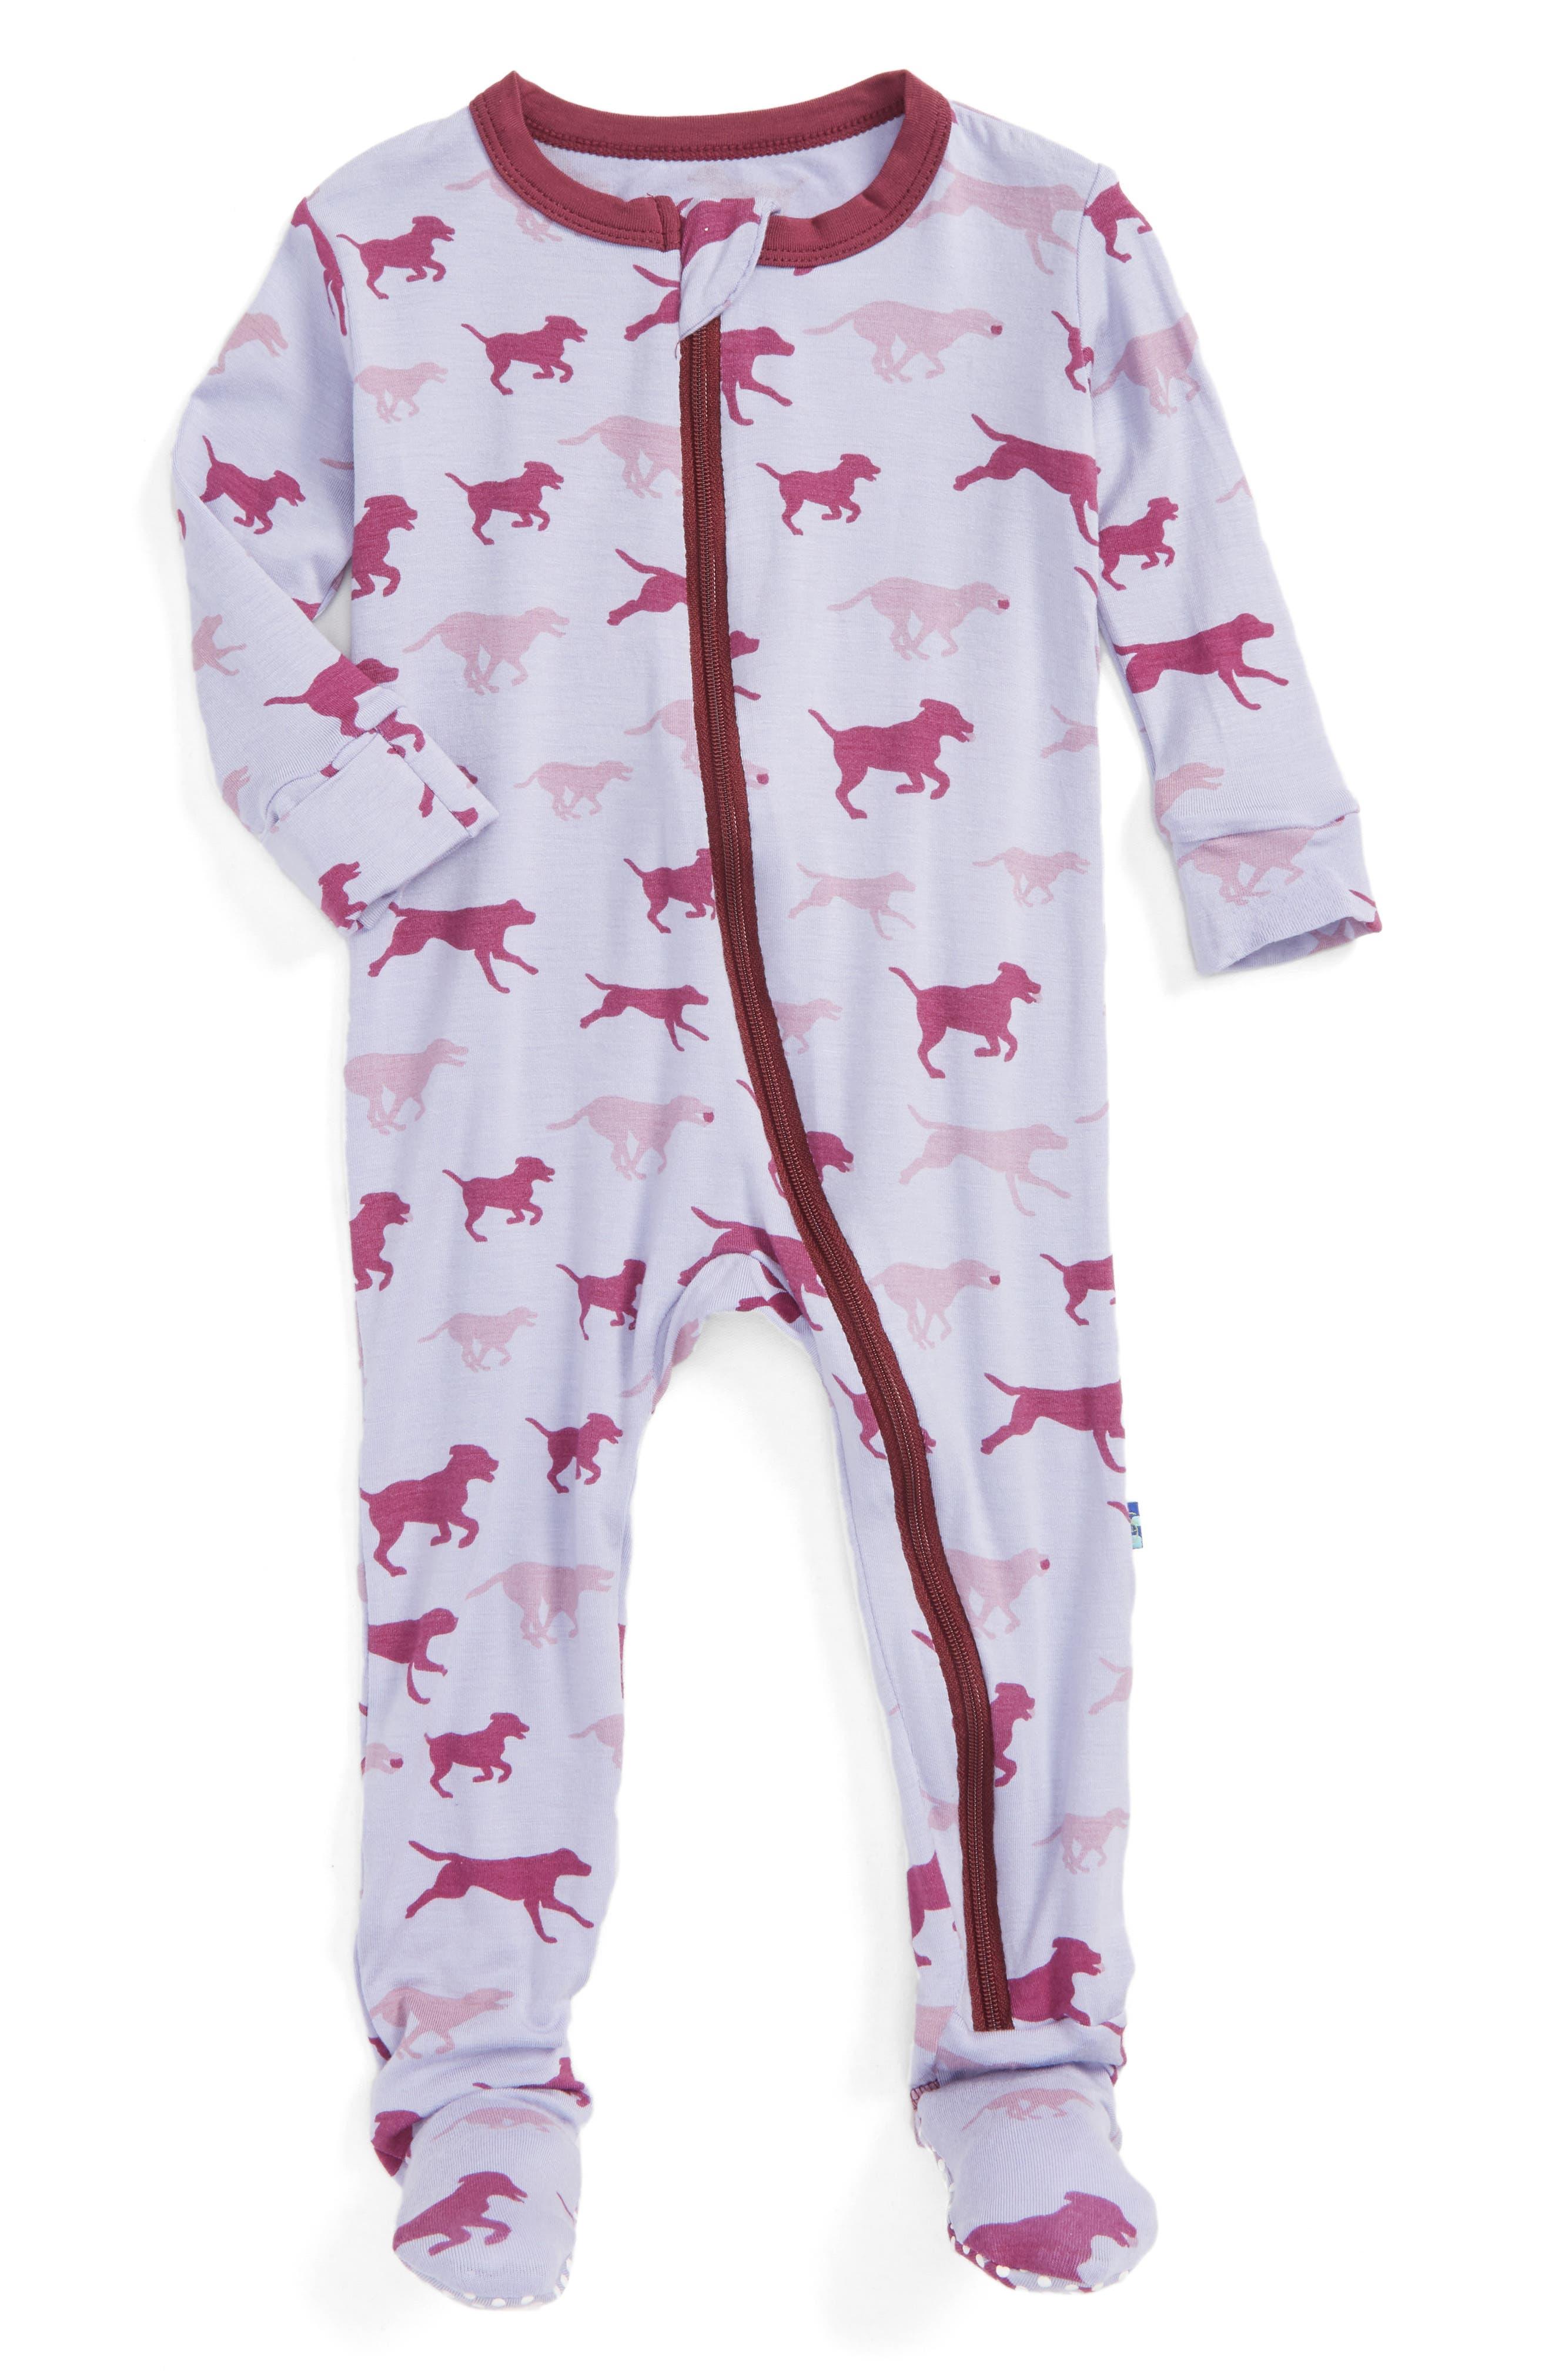 KICKEE PANTS Print Fitted One-Piece Footie Pajamas